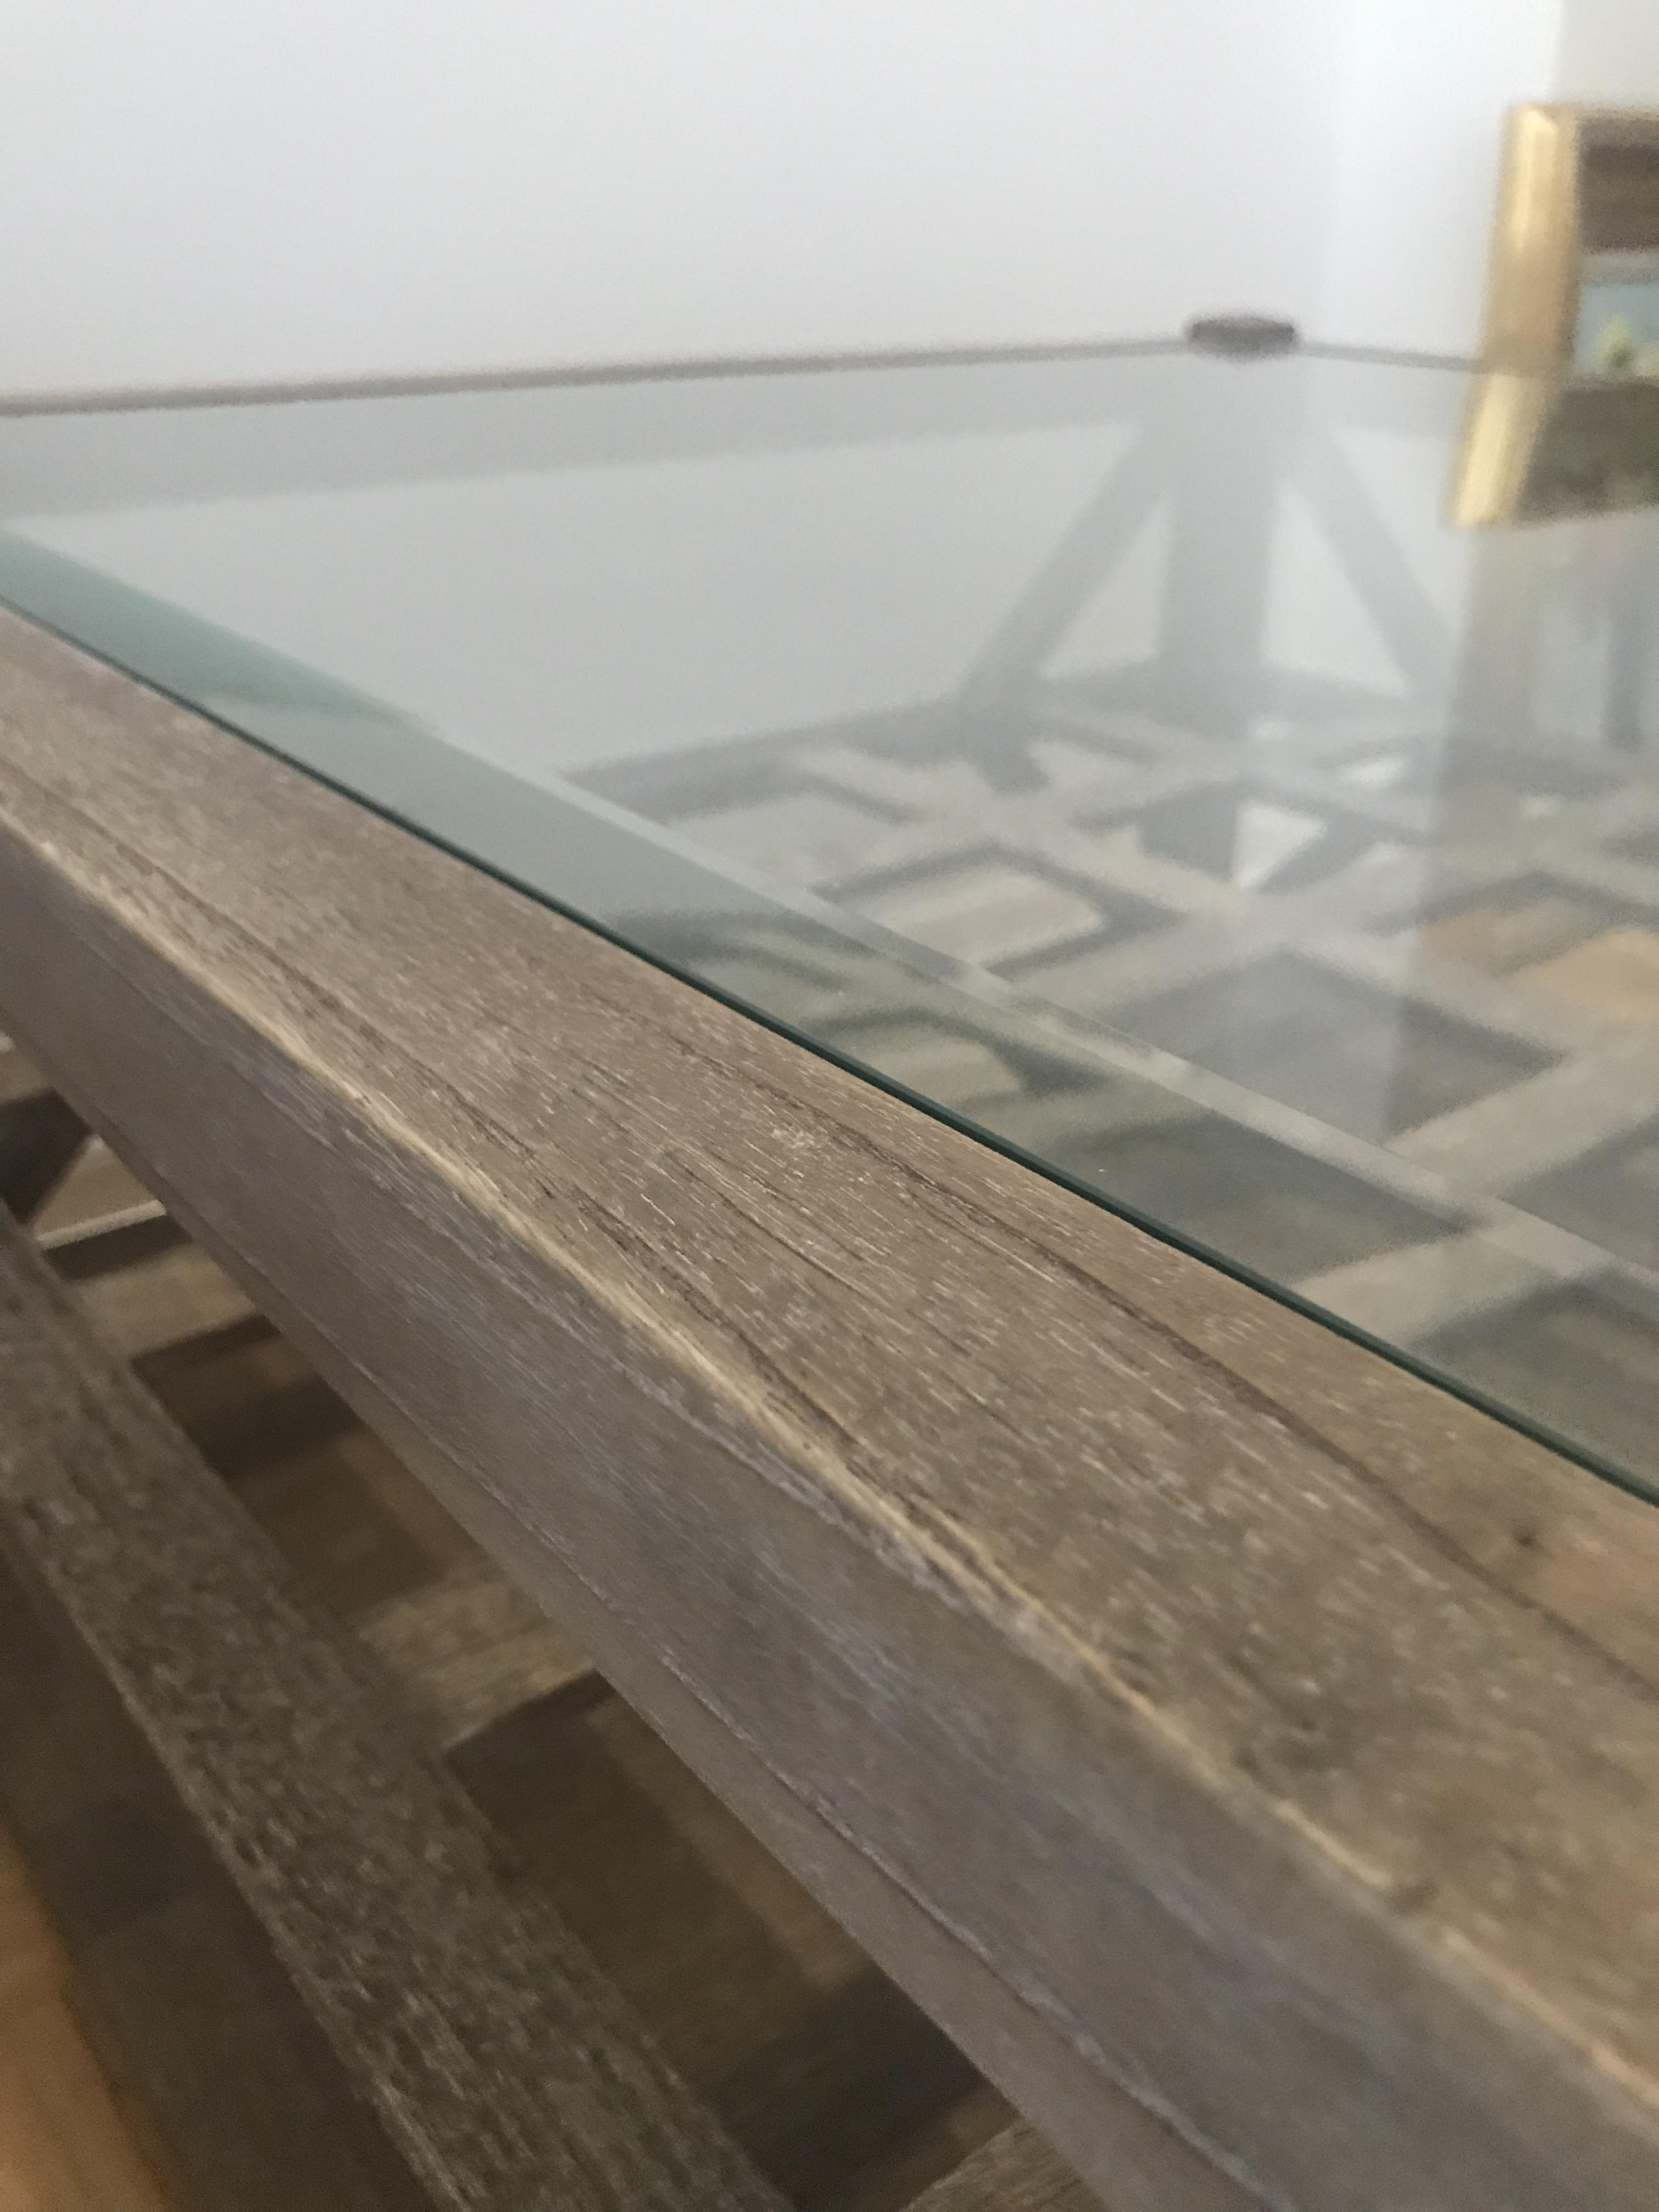 Arhaus Washed Wood Coffee Table w/ Glass Top